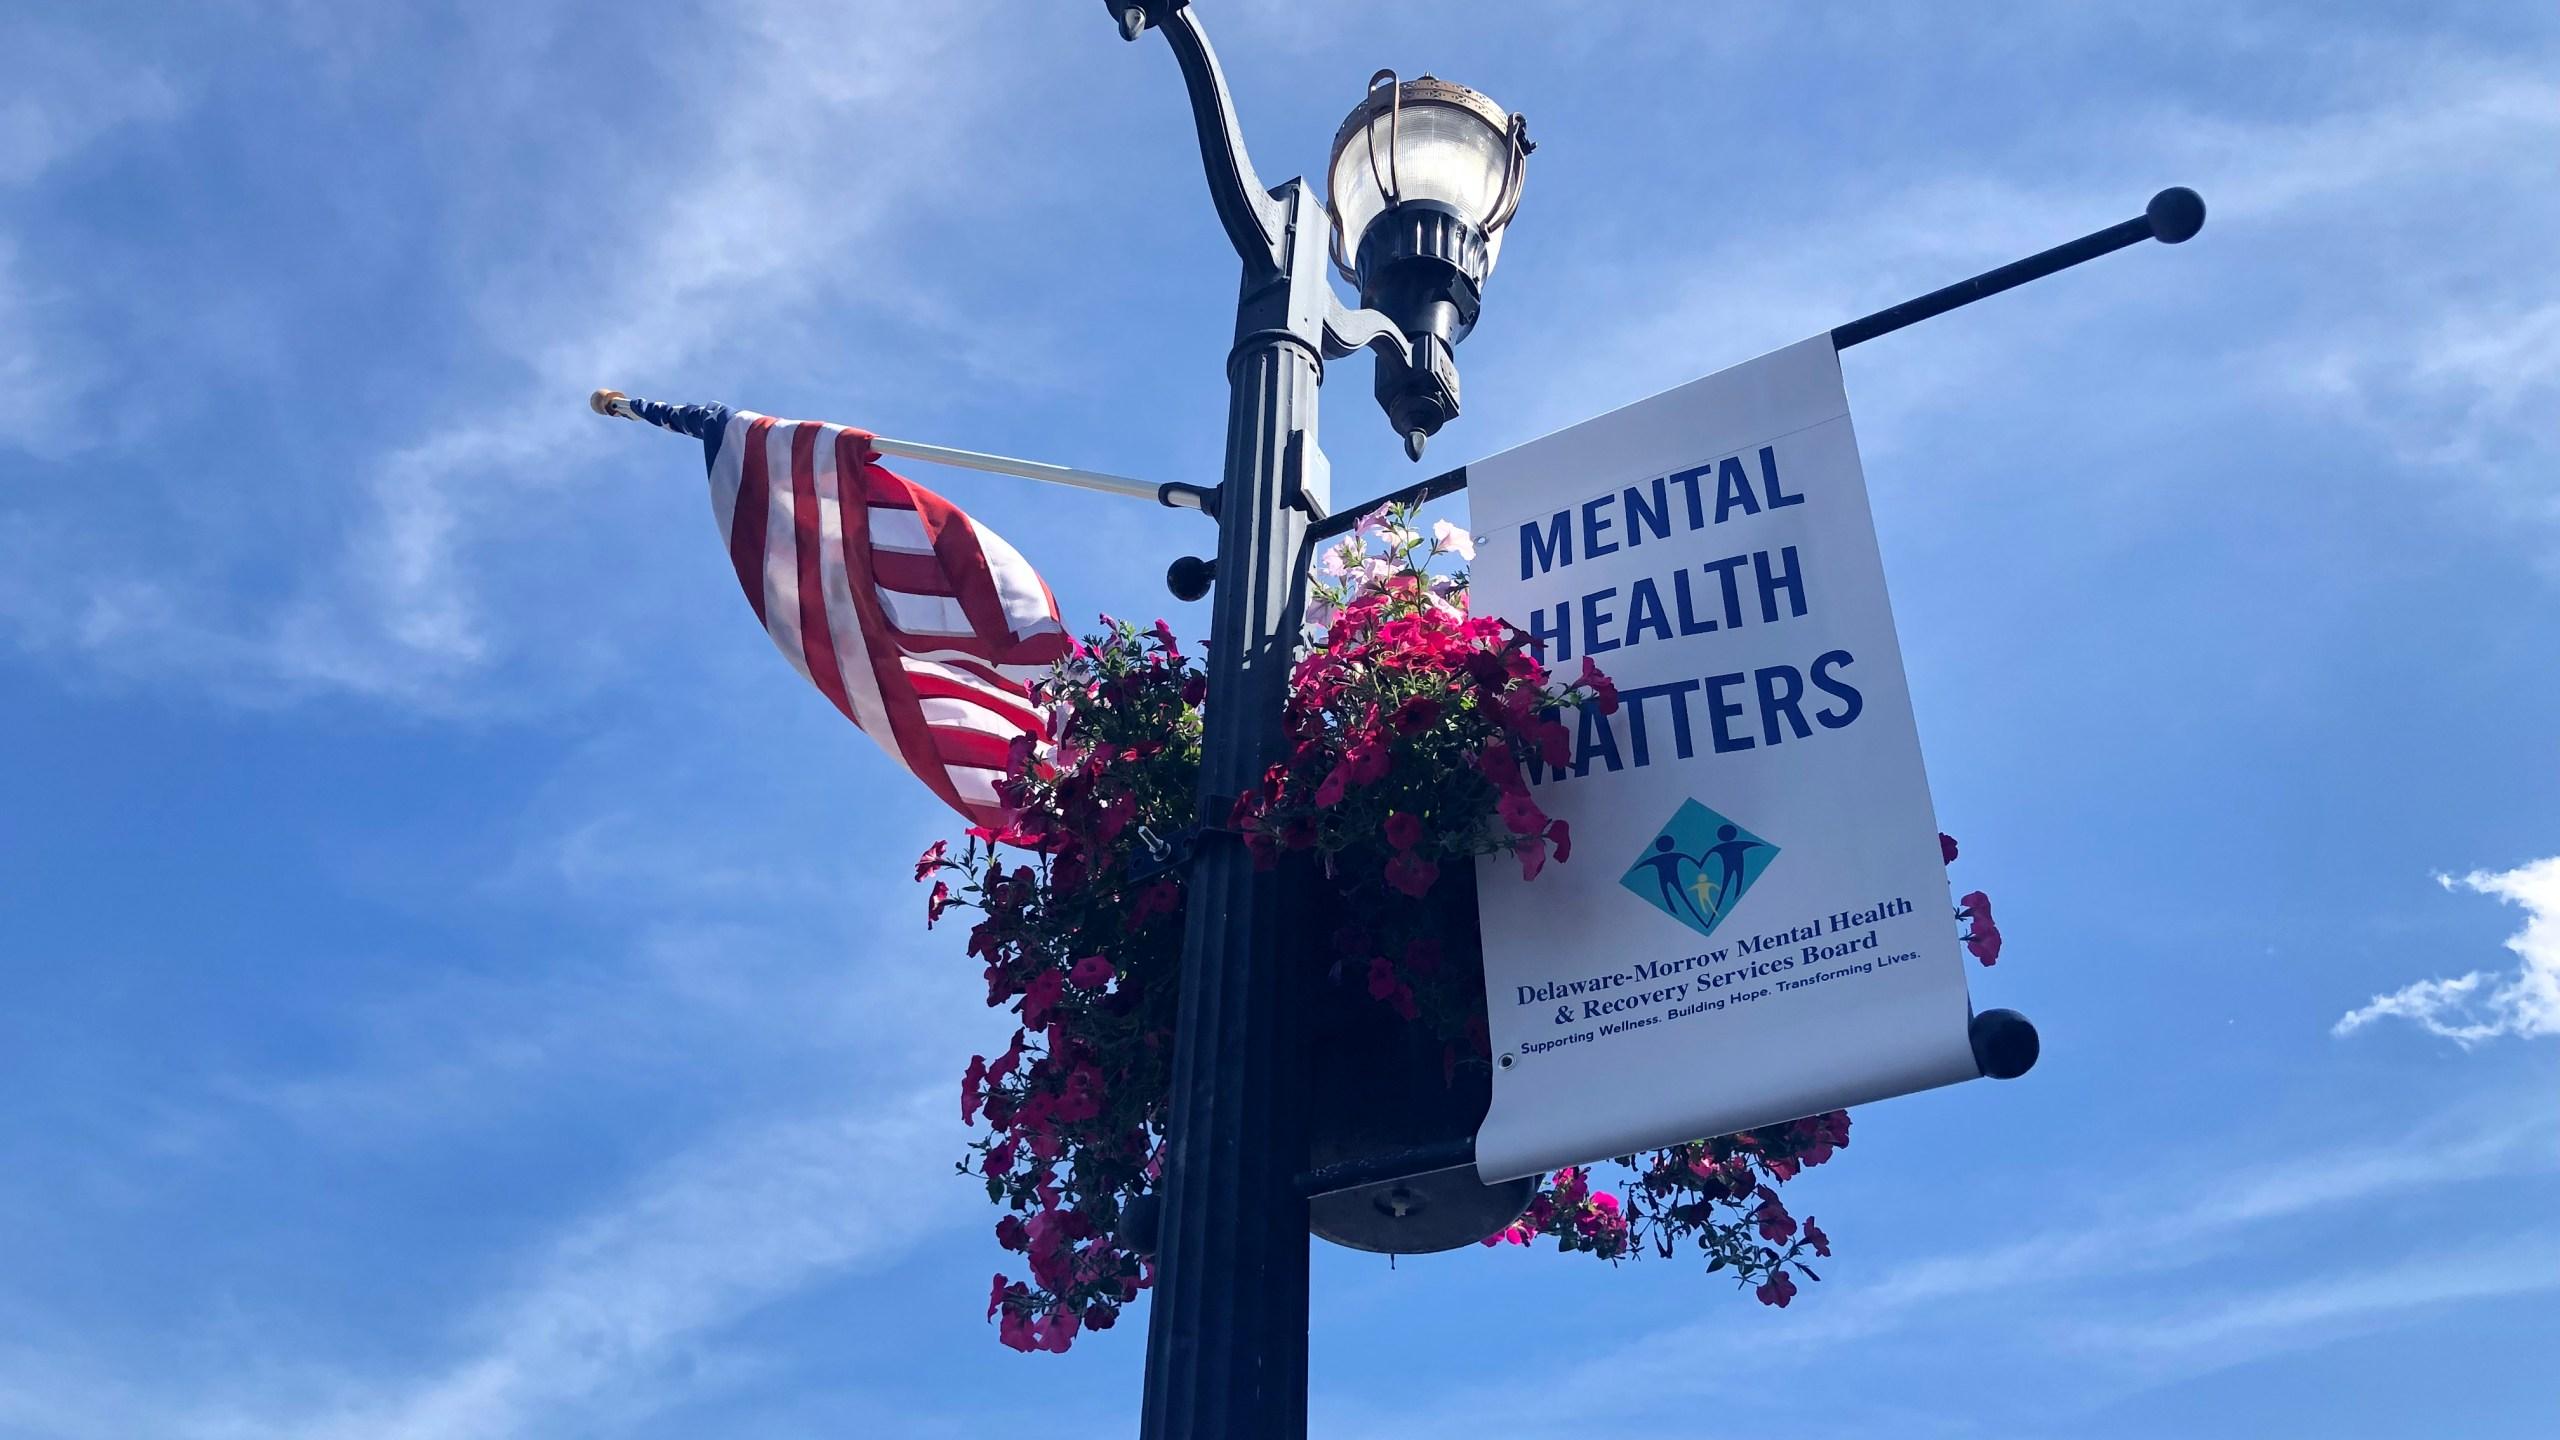 Delaware Ohio mental health matters